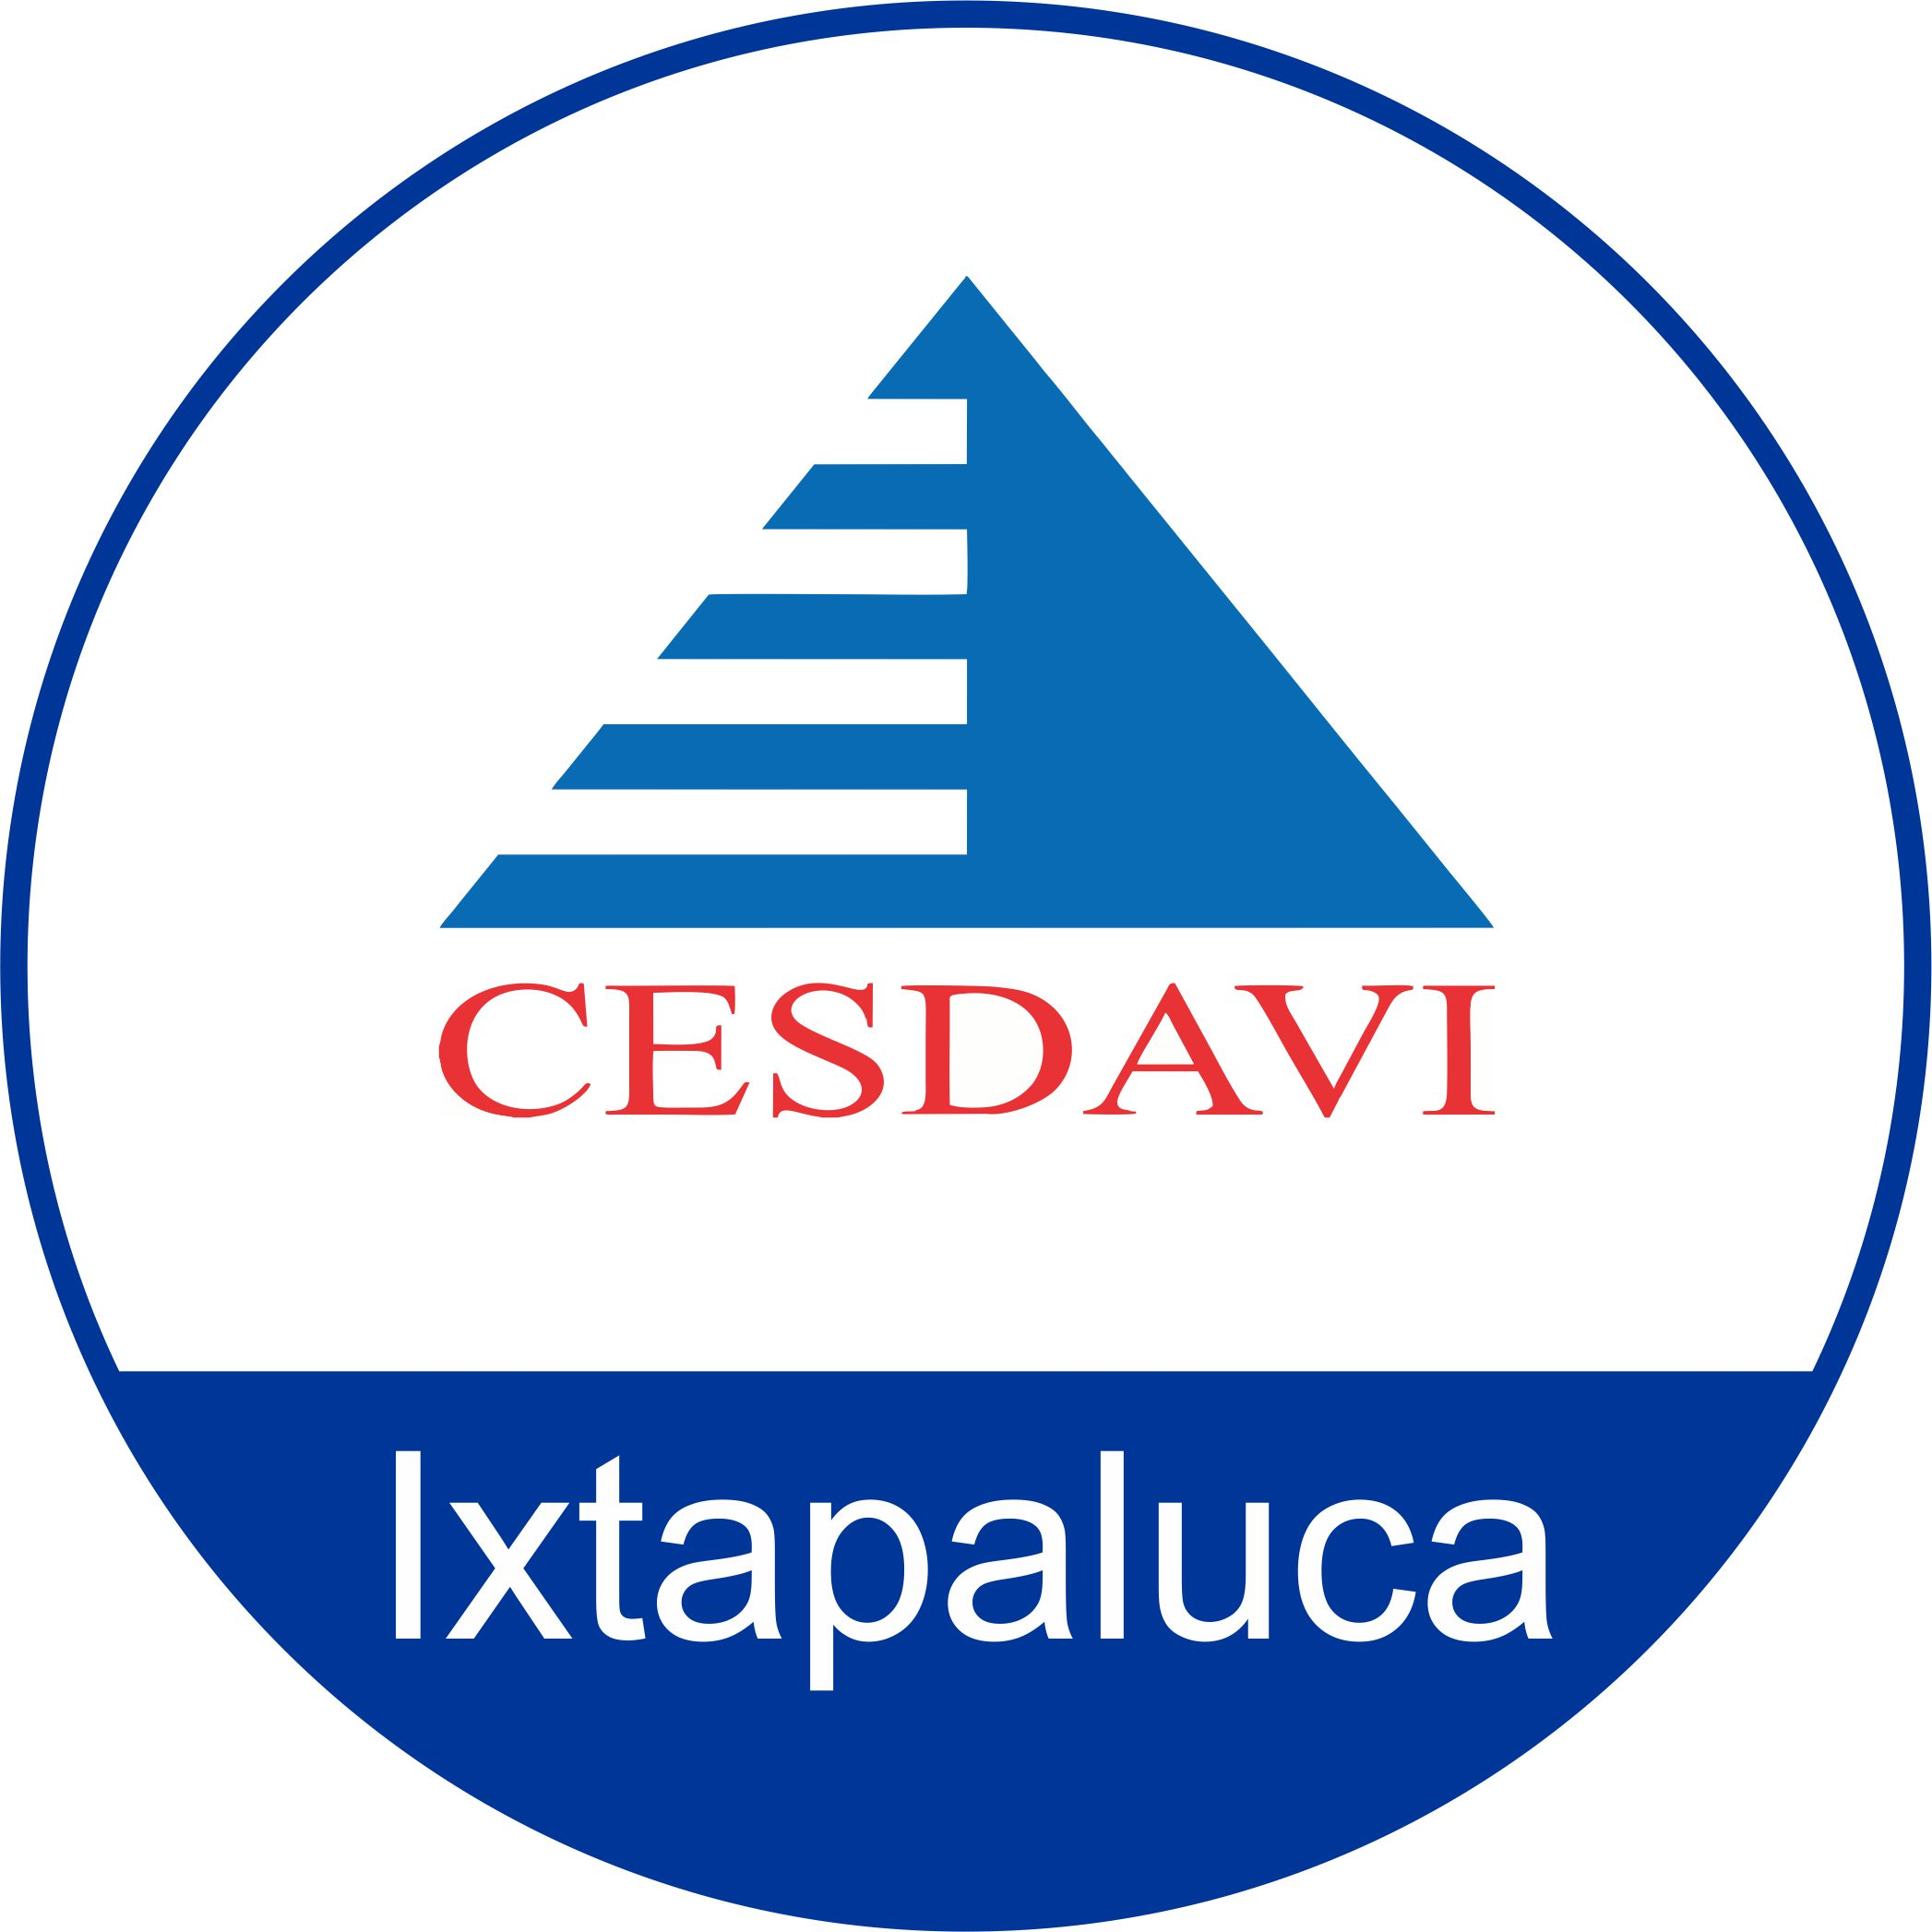 """CESDAVI"" Alupratic Ixtapaluca"